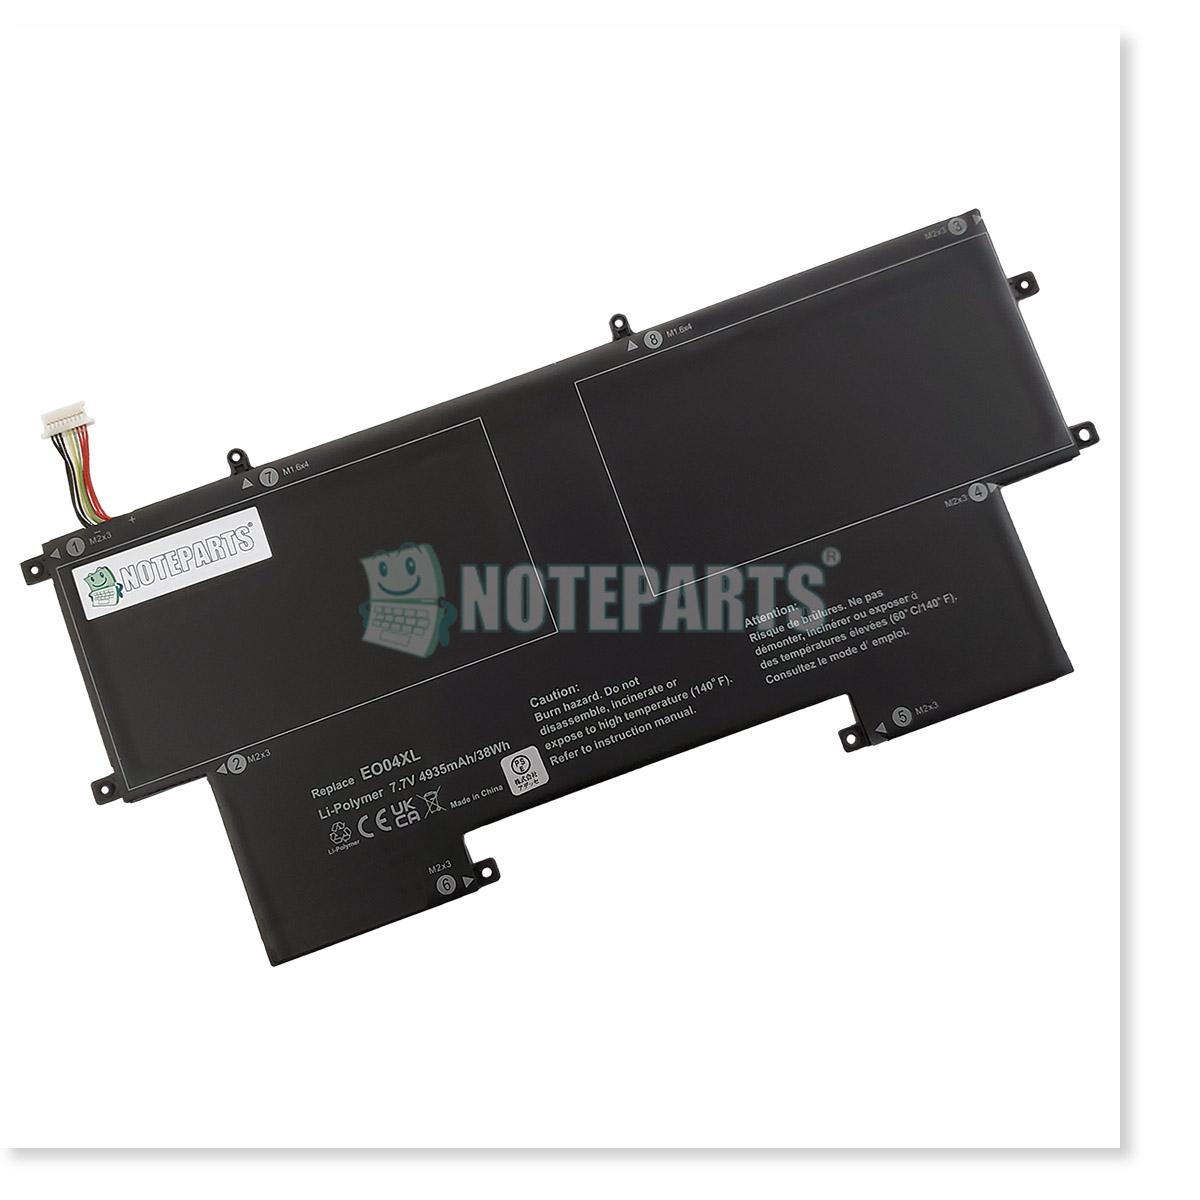 HP EliteBook Folio G1 バッテリー 828226-005 EO04XL対応 一般コネクタータイプ